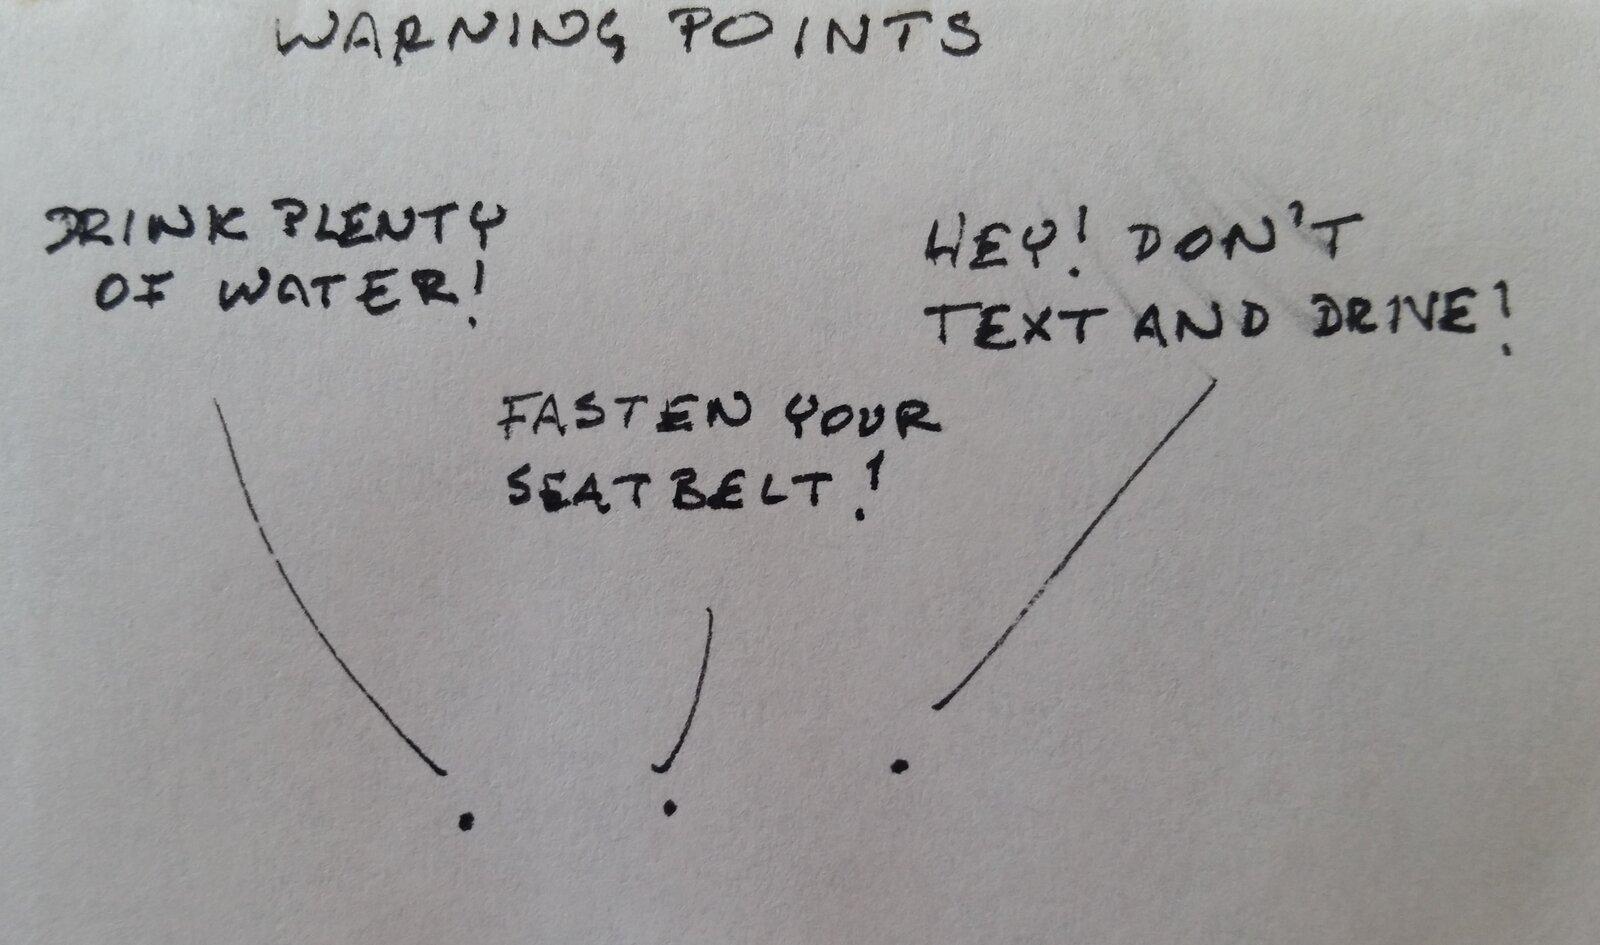 warningpoints.jpg